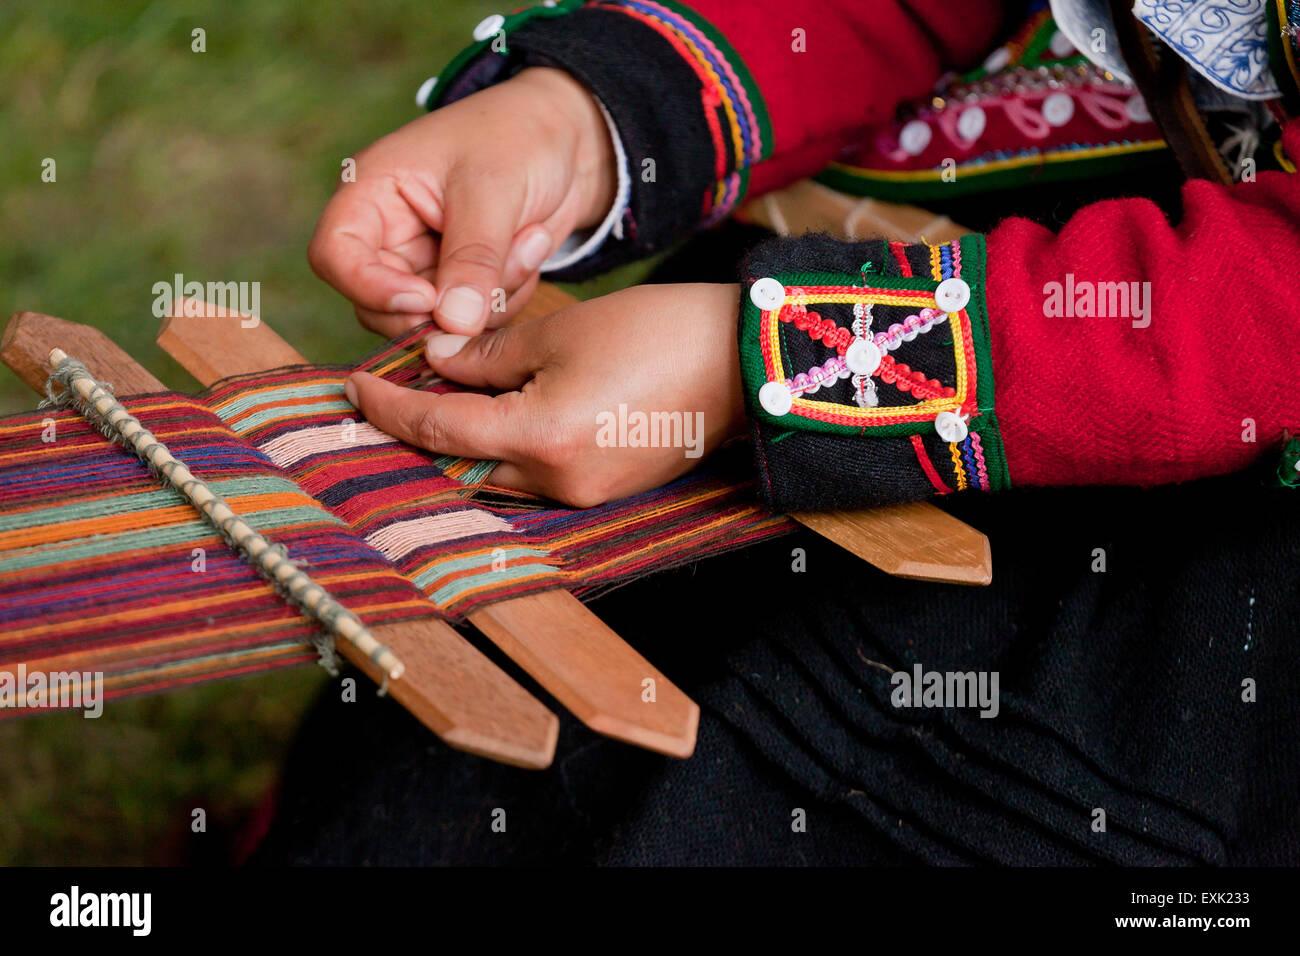 Peruvian woman from Chinchero weaving traditional fabric using back strap loom Stock Photo